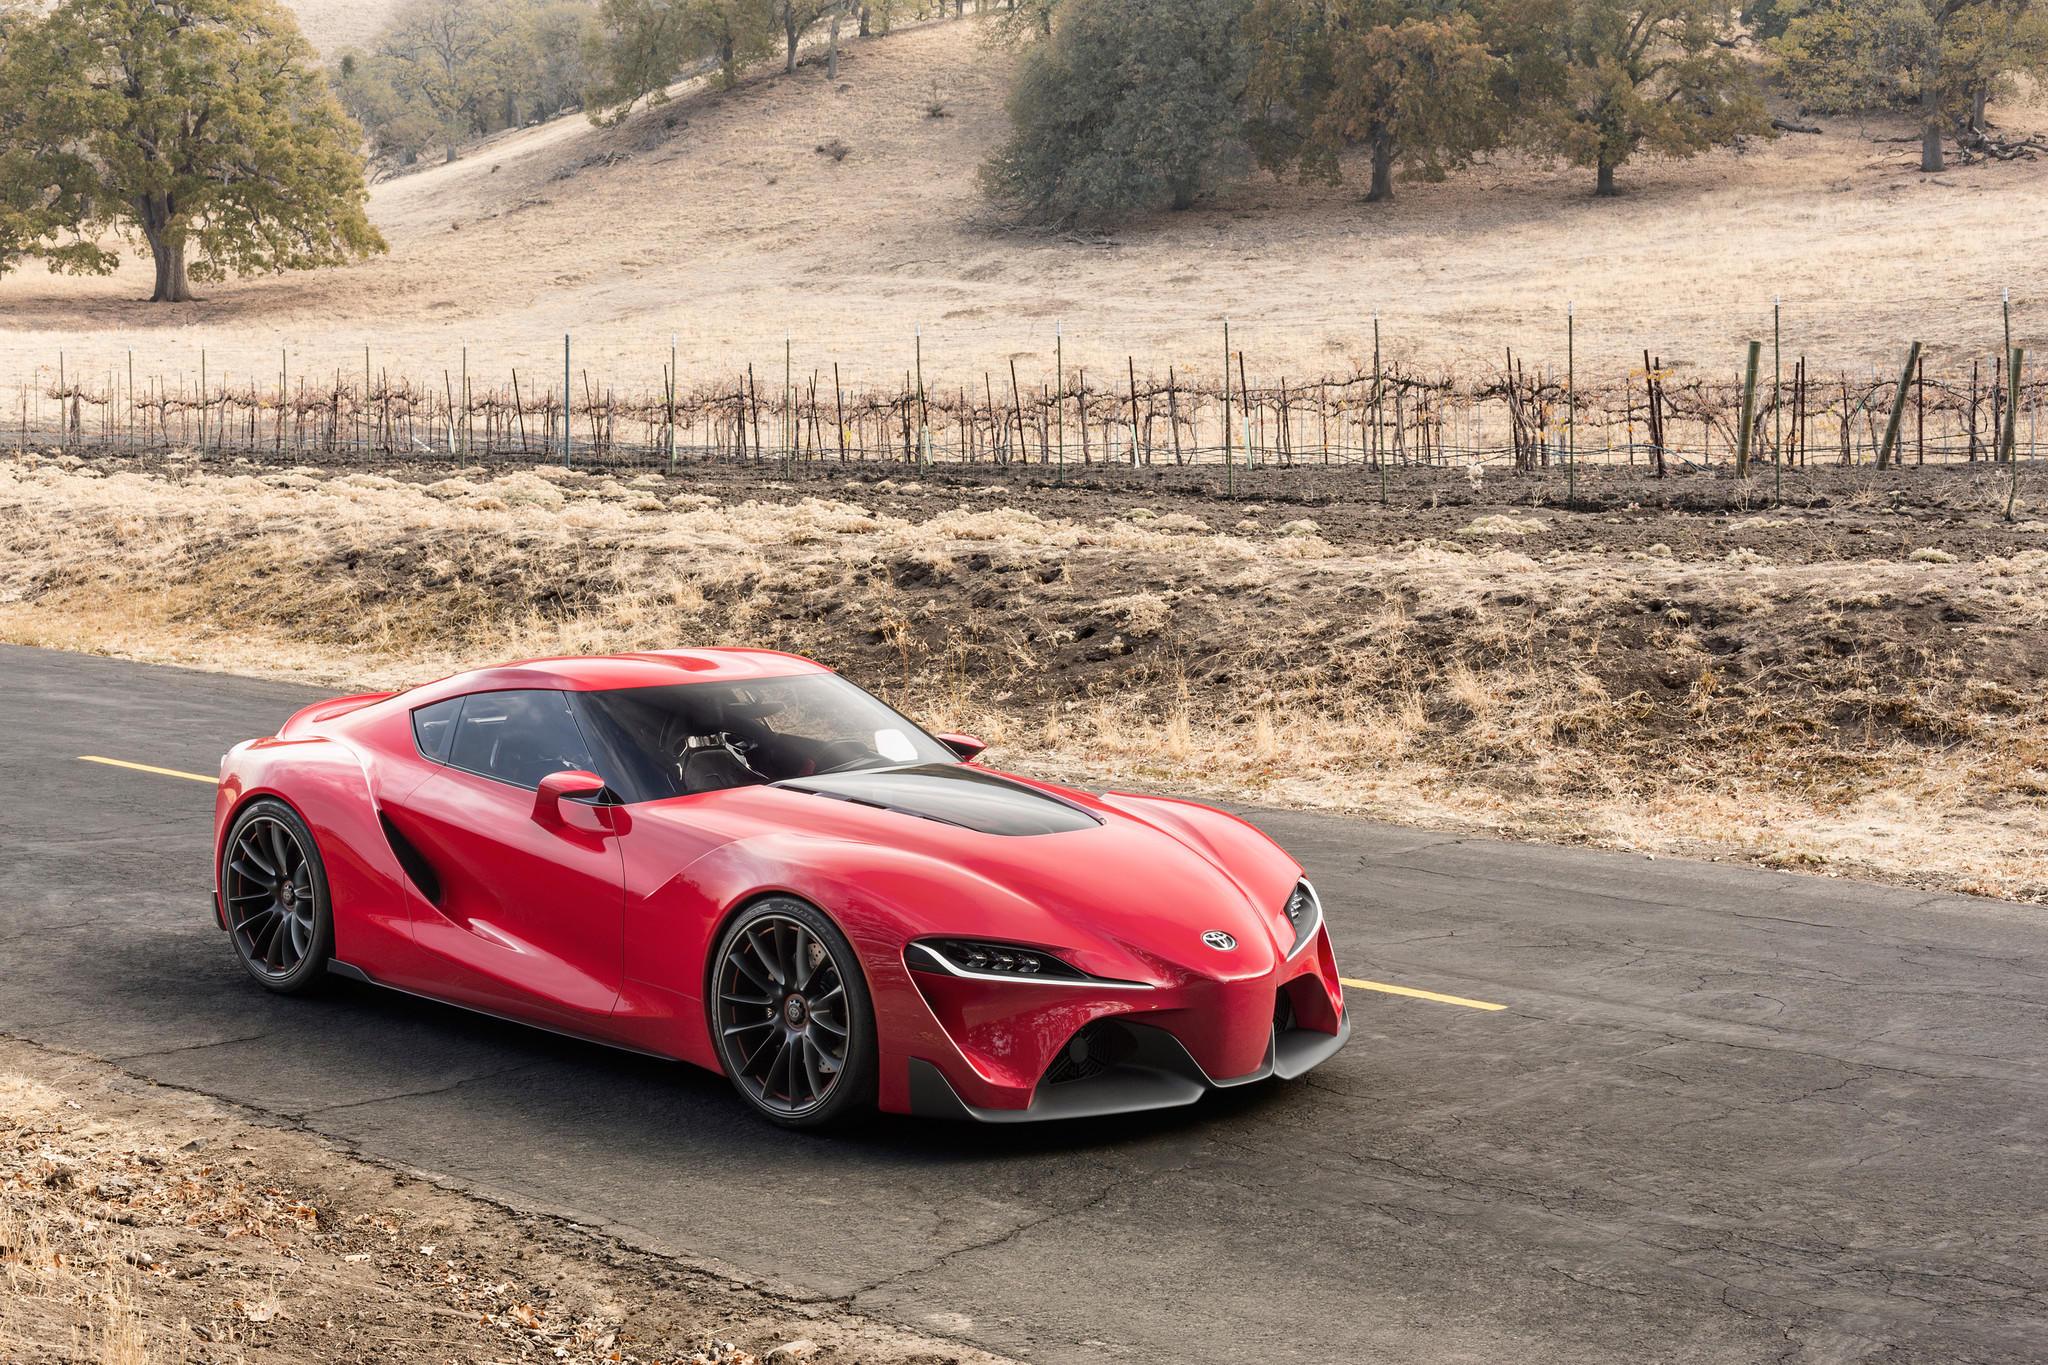 Detroit Auto Show Toyota Debuts The Ft 1 Concept The Next Supra